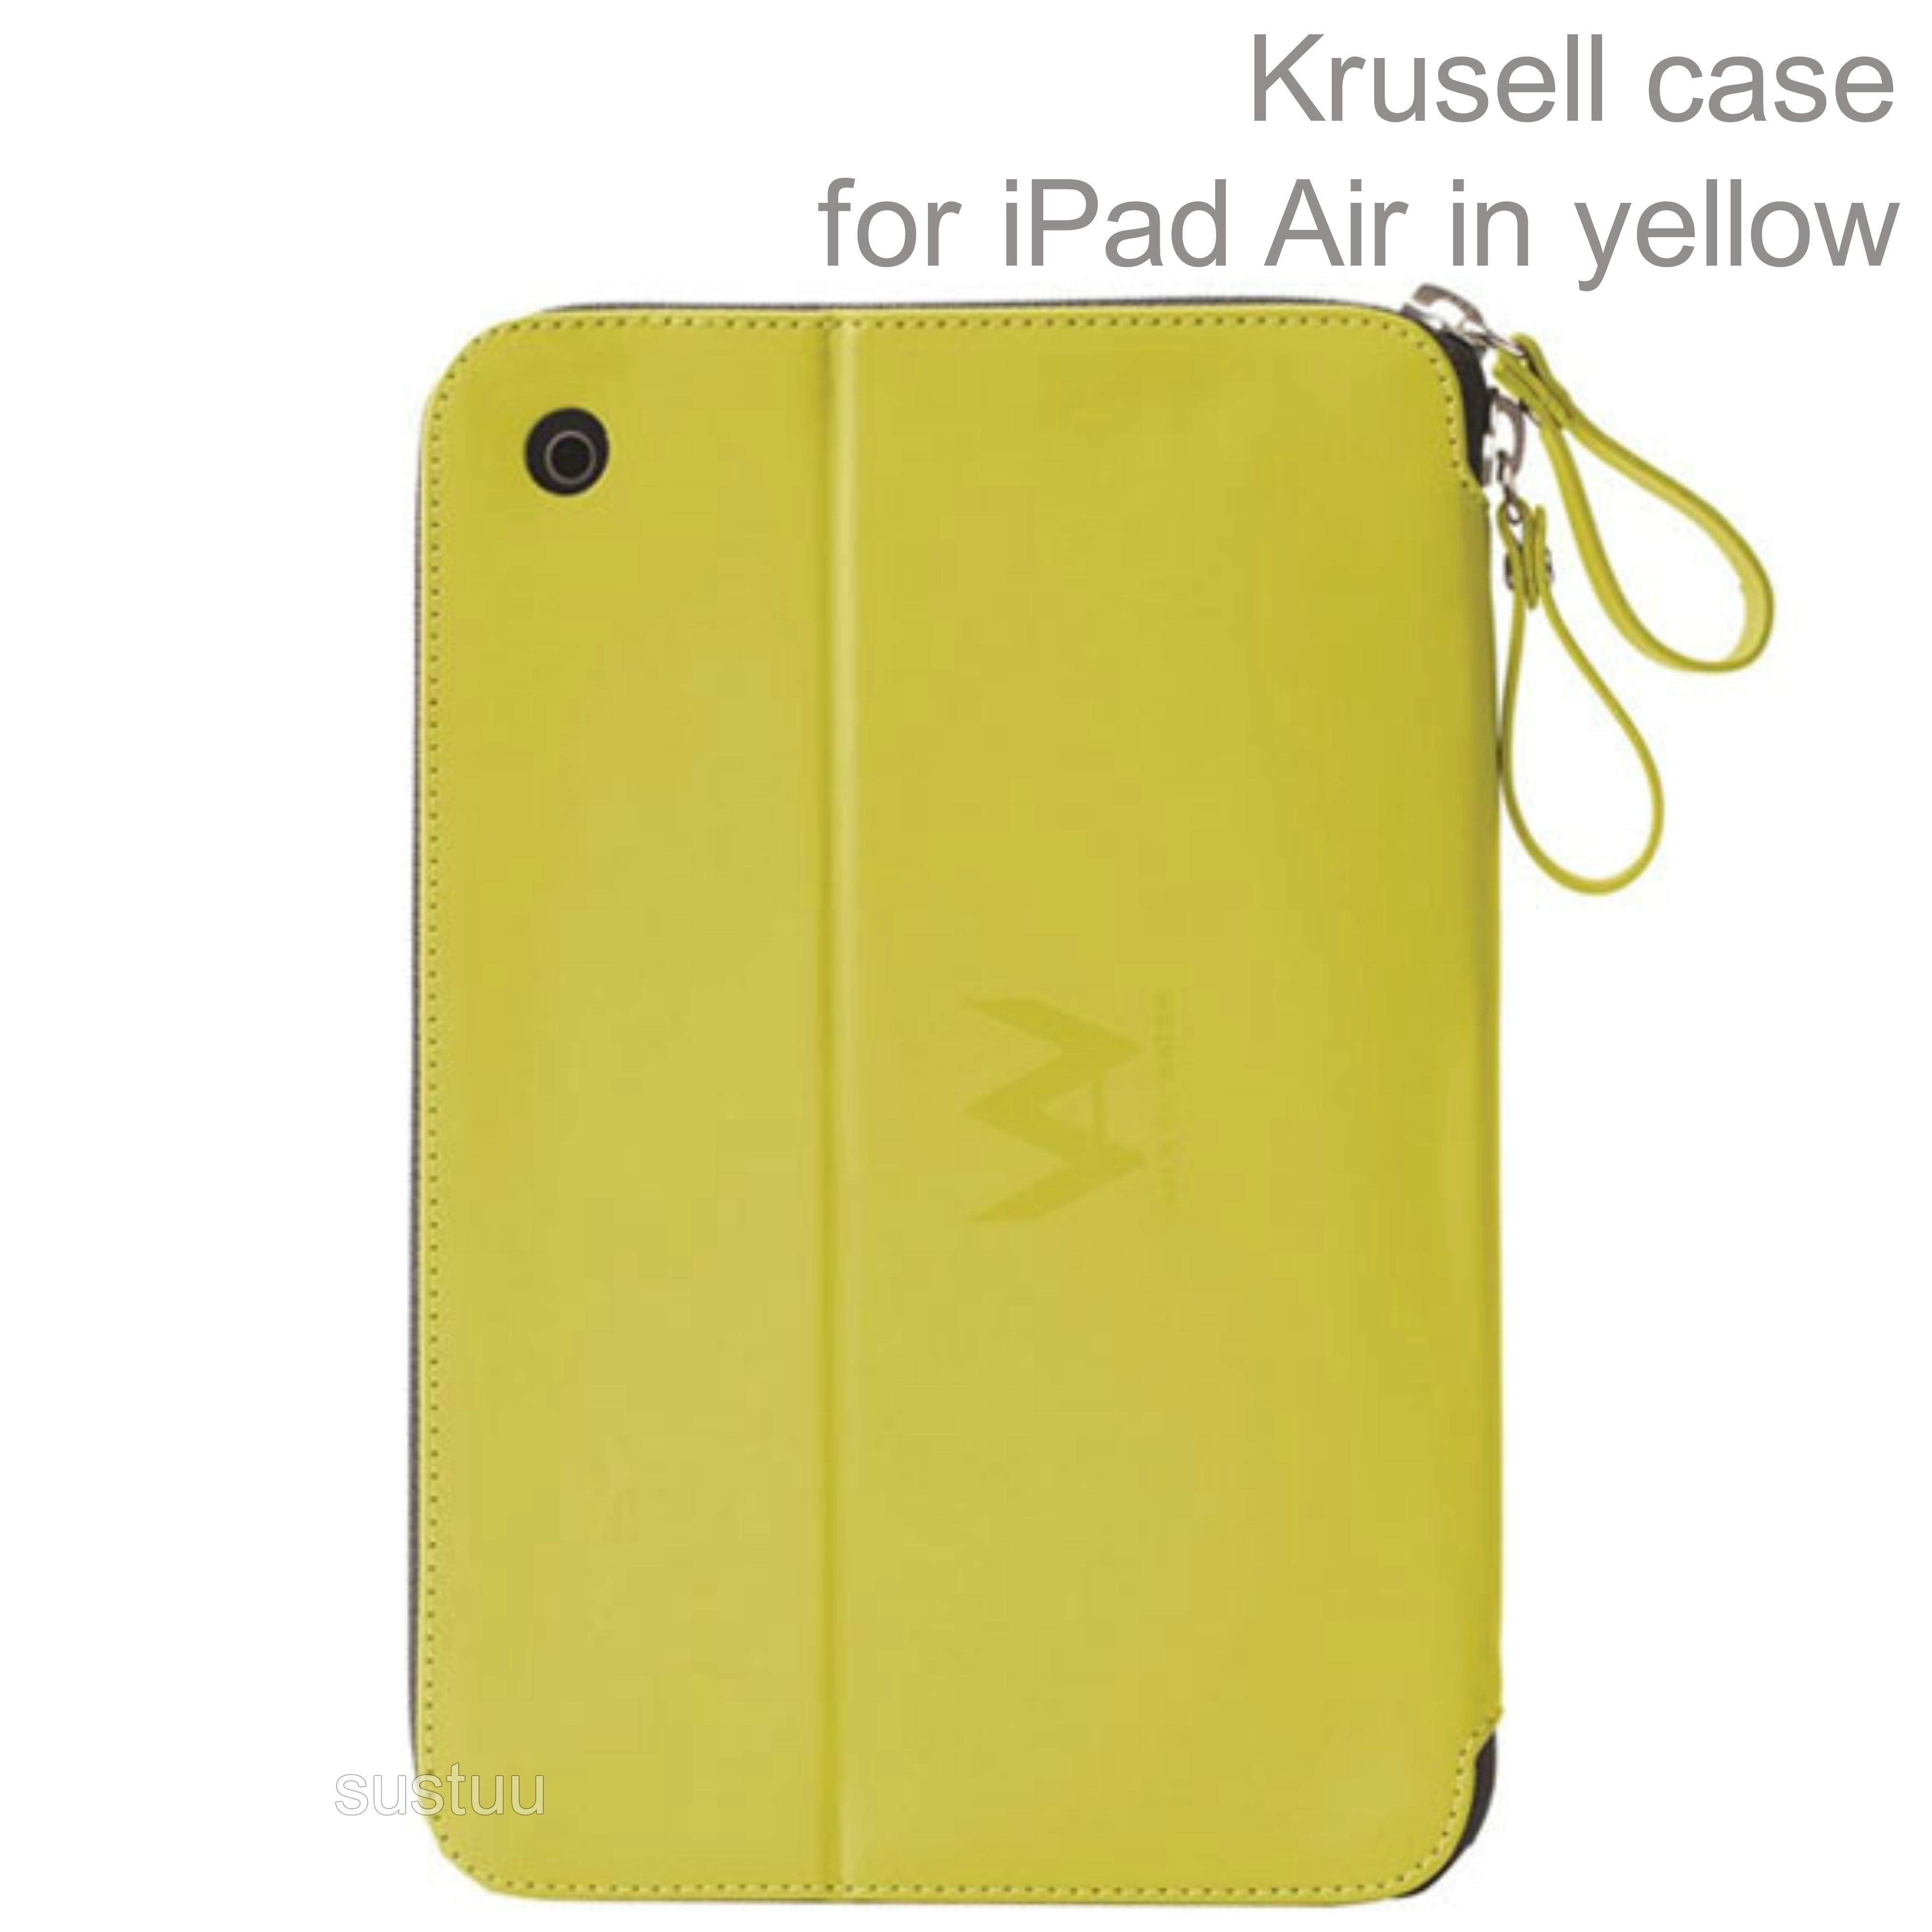 Krusell velvetlook Tablet Flip Case Cover | Water Splash Proof | iPad Air-Yellow | New